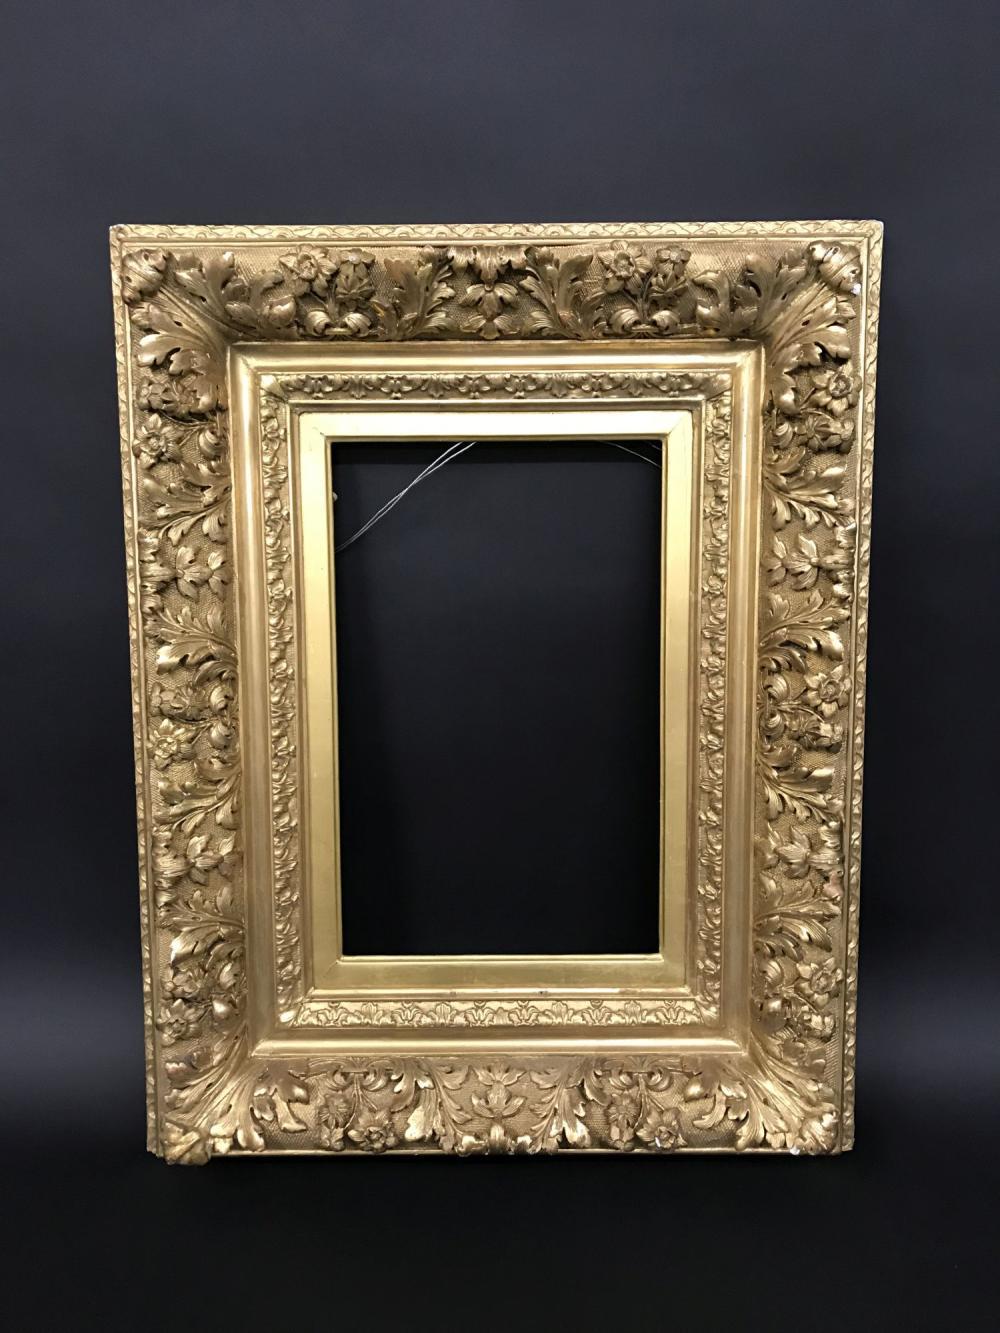 19th Century French School A Fine Gilt Composition Barbizon Frame